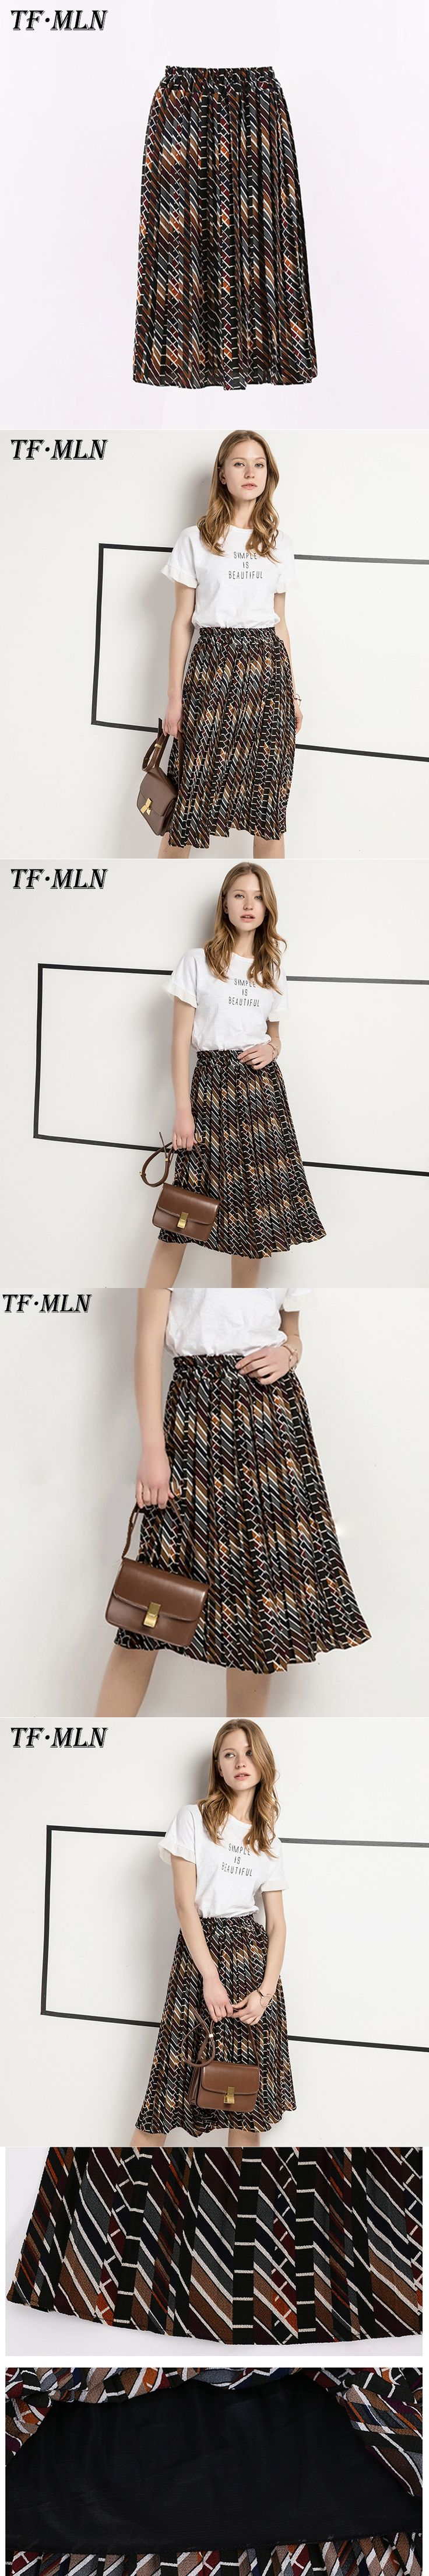 TFMLN 2017 Spring Autumn And Winter skirts womens saia faldas mujer skirt jupe saias stretch thin female Fashion Chiffon skirts